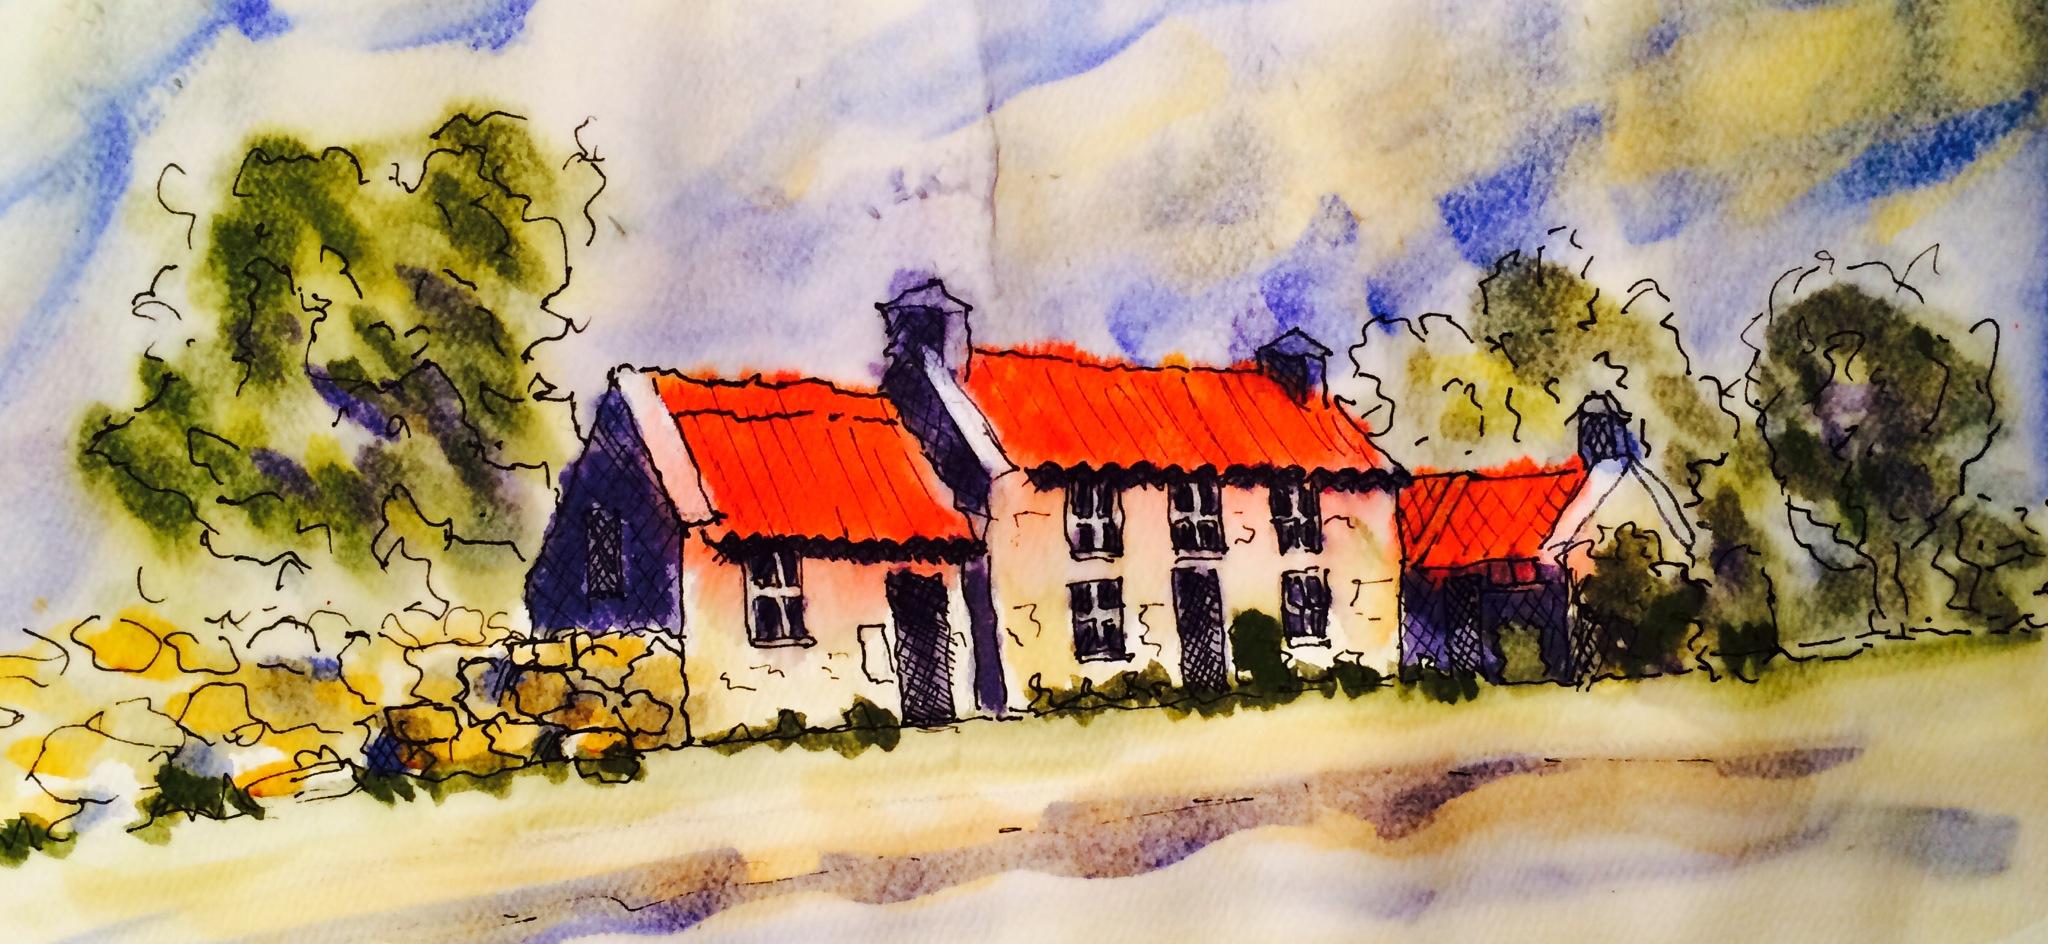 Line Art Watercolor : Watercolor mishap line and wash janna vanderveen